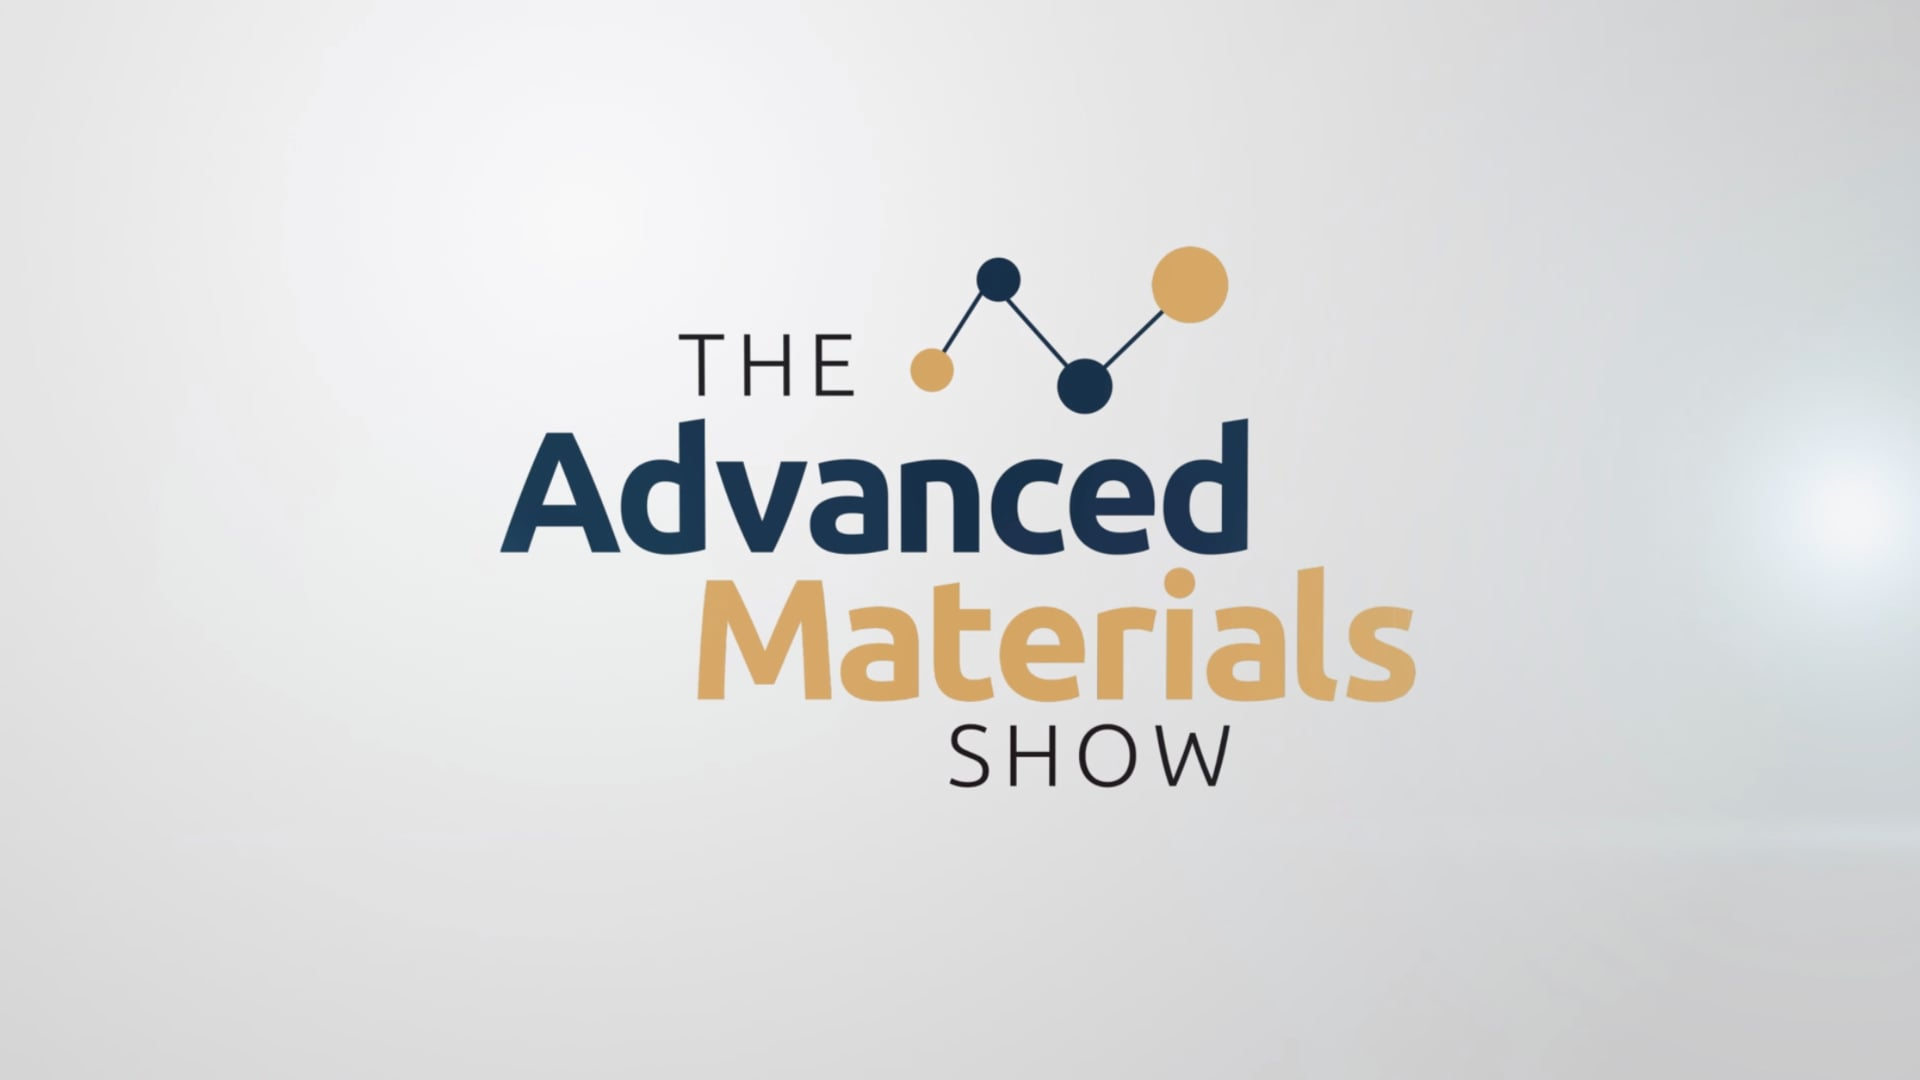 The Advanced Materials Show